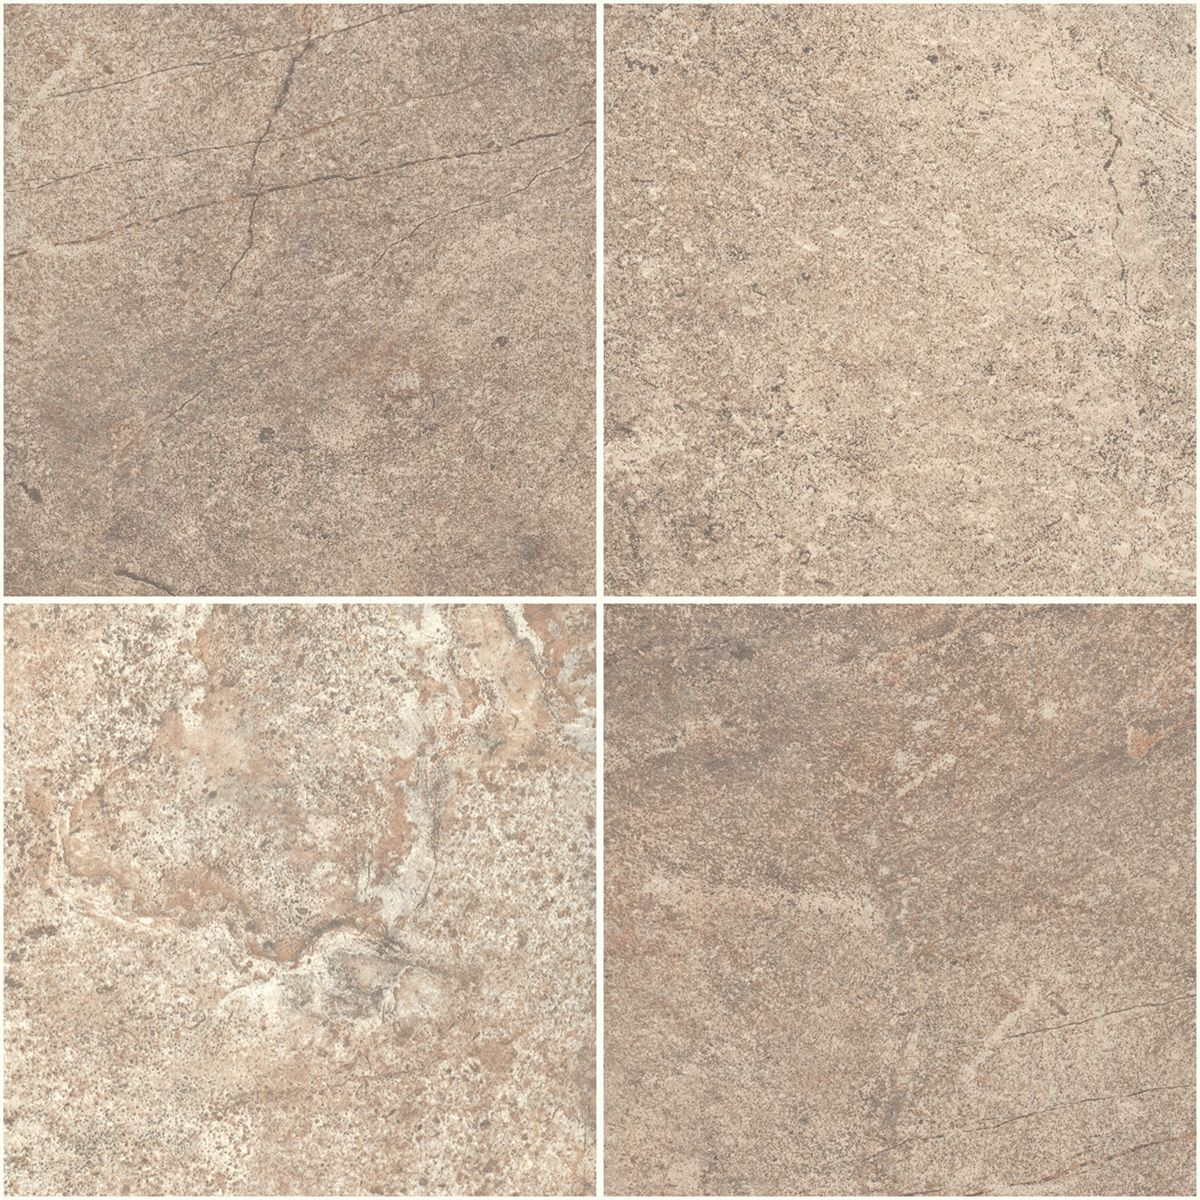 Dal Tile Valtellina Alpine Pass 13 X 13 Glazed Porcelain Tile Ceramic Flooring Cspora359 13 Dal Tile Porcelain Tile Ceramic Floor